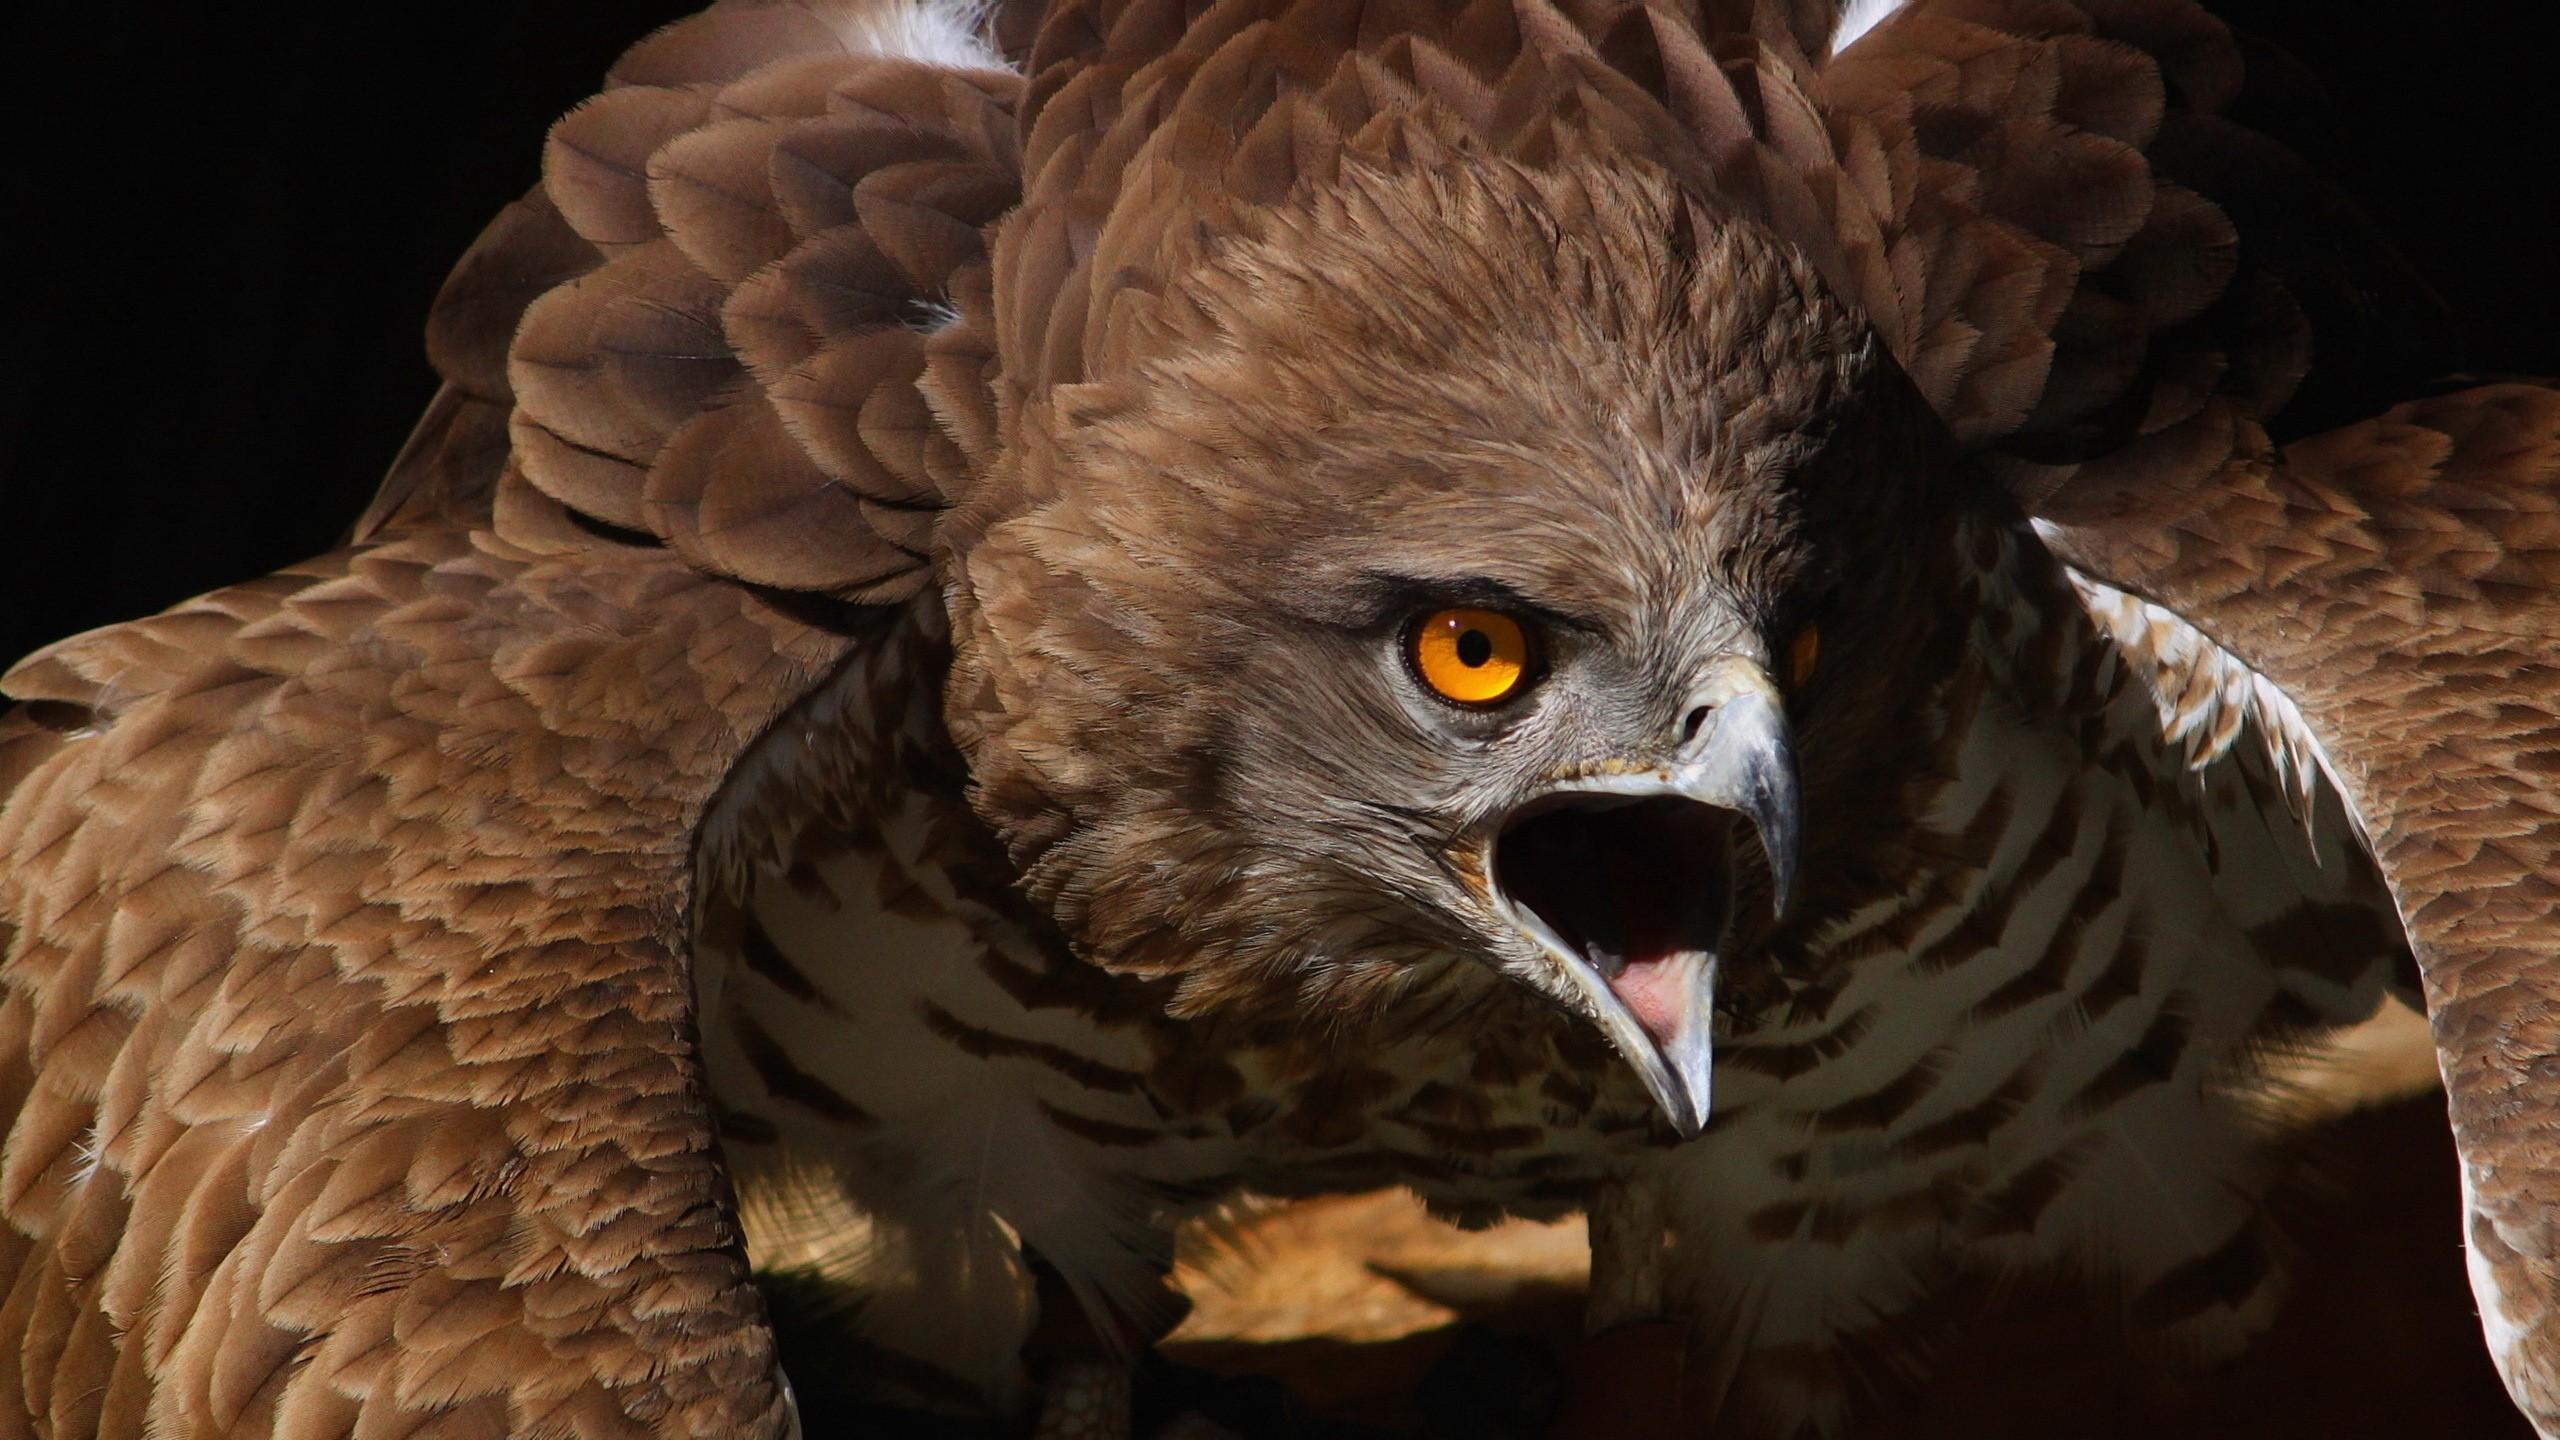 Free Download Fond Ecran Hd Animaux Oiseau De Proie Aigle